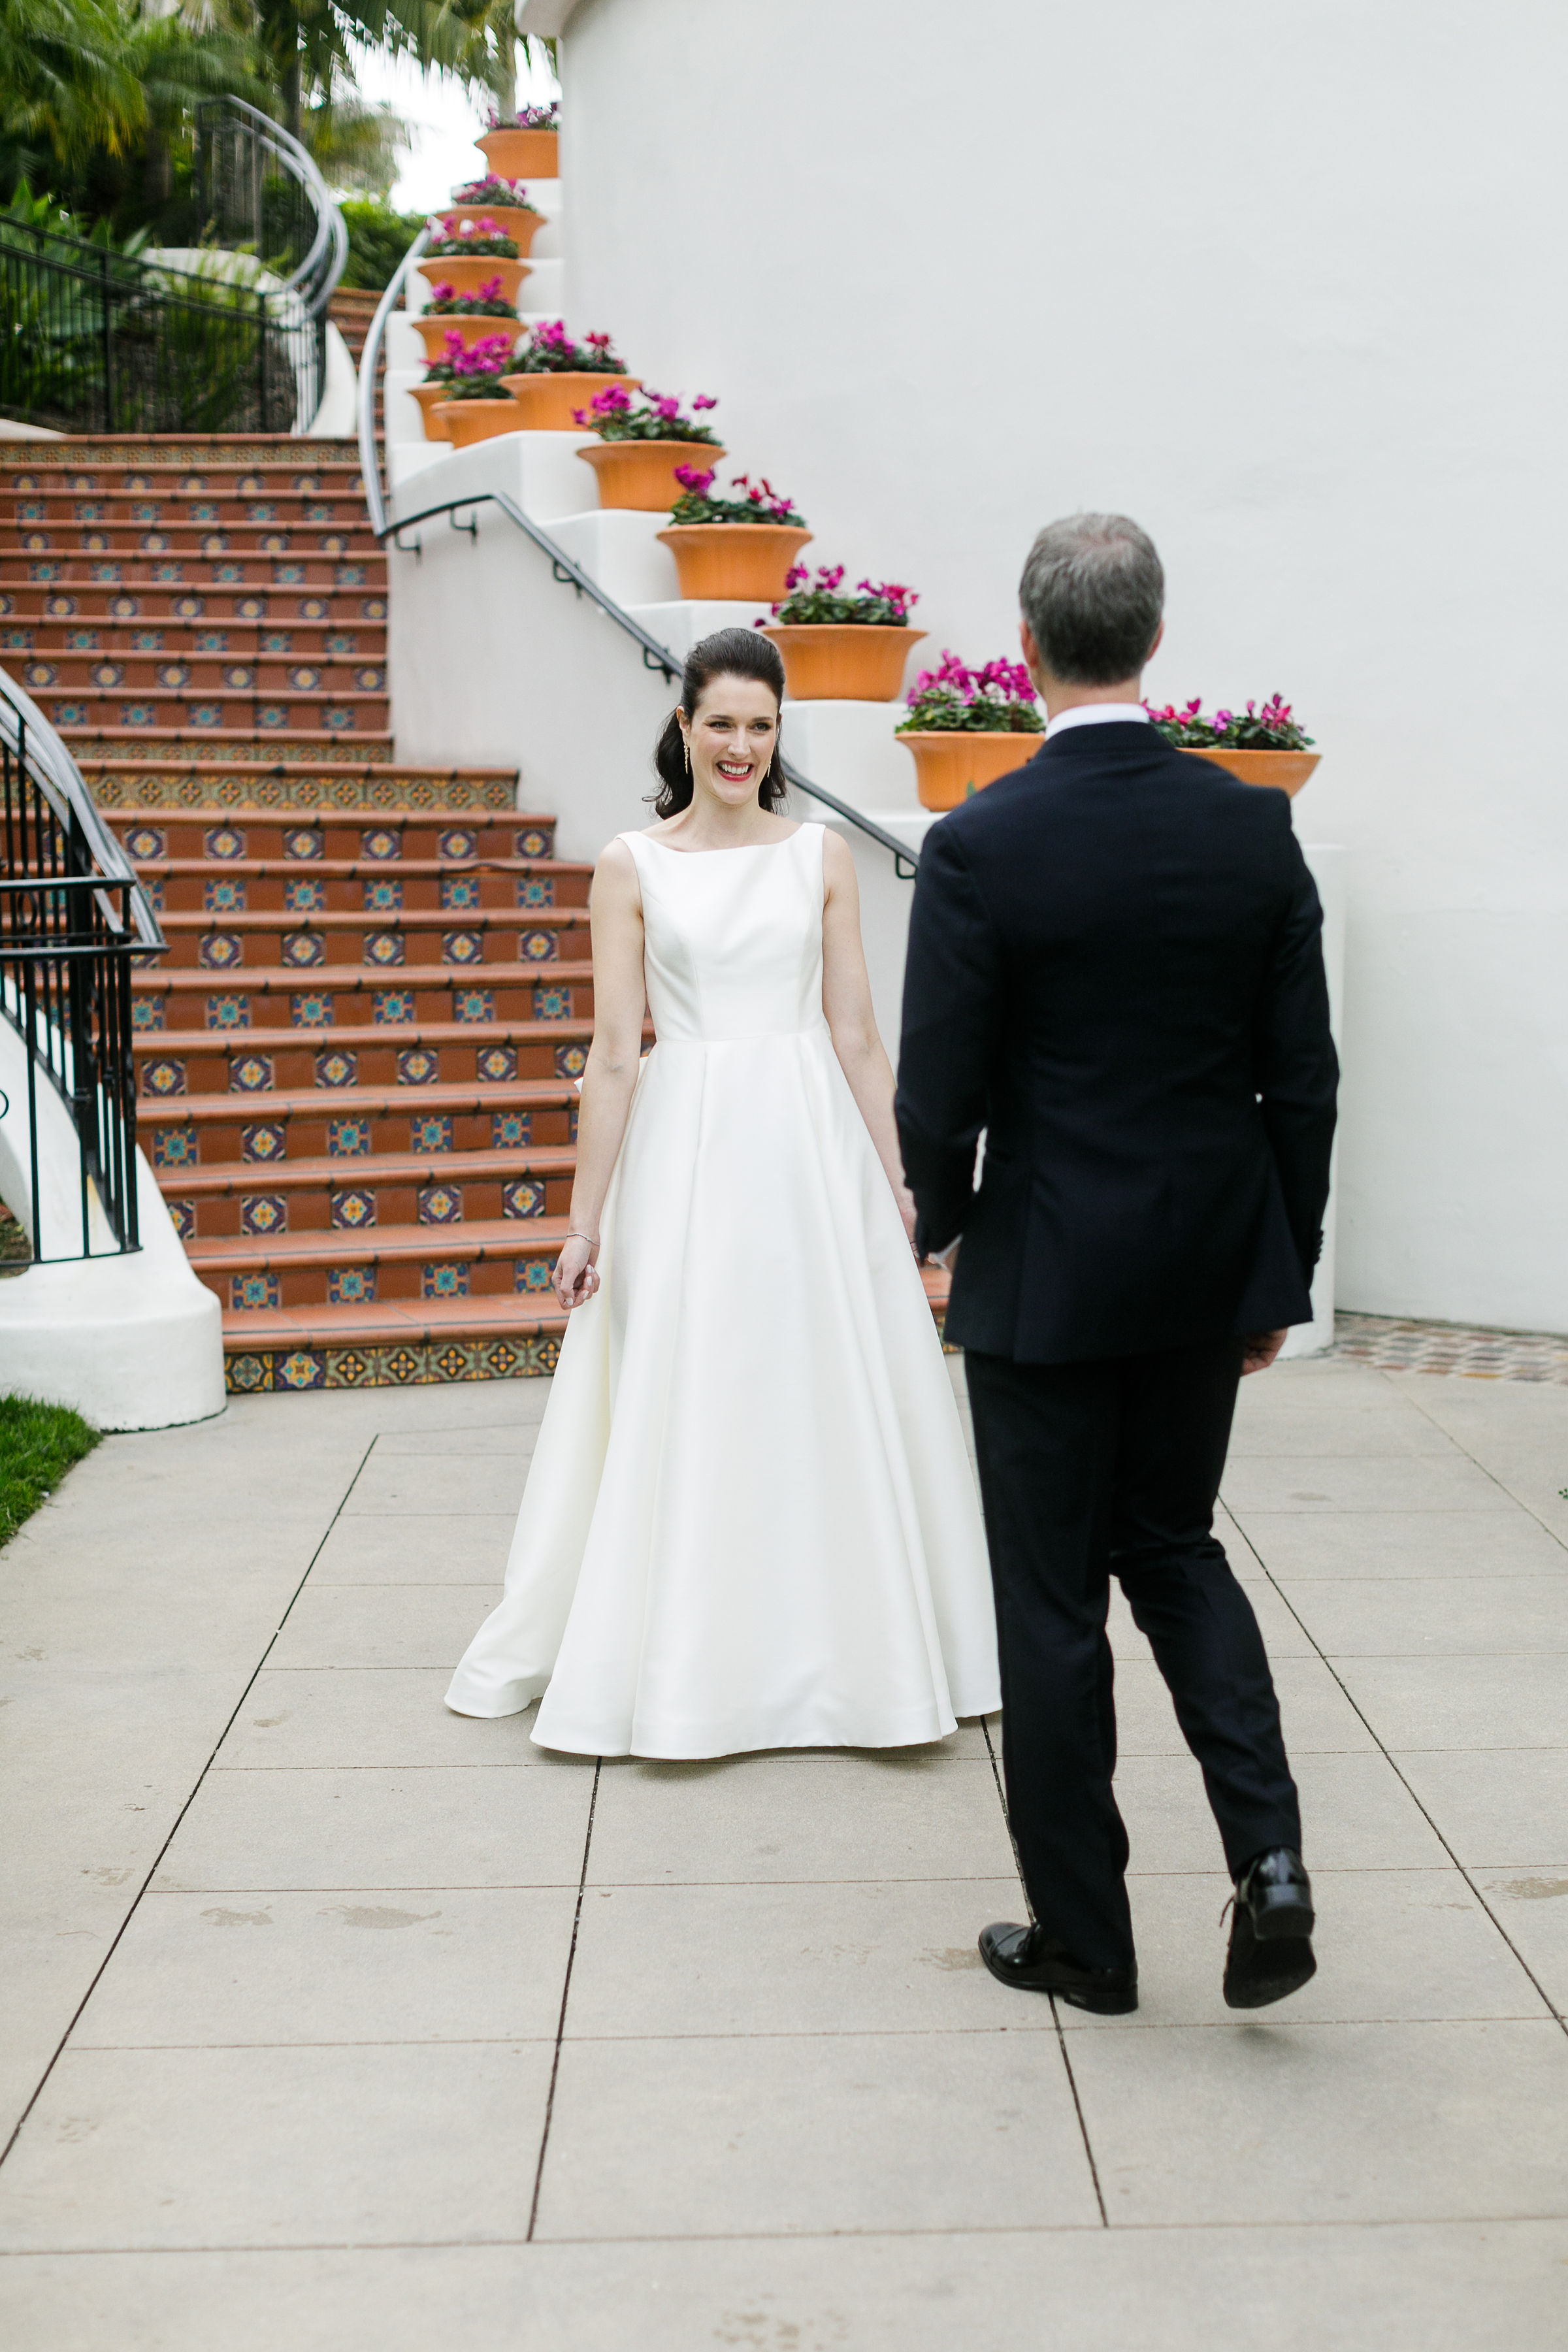 www.santabarbarawedding.com   Kiel Rucker Photography   The Ritz Carlton Bacara   Event of the Season   Sareh Nouri   First Look